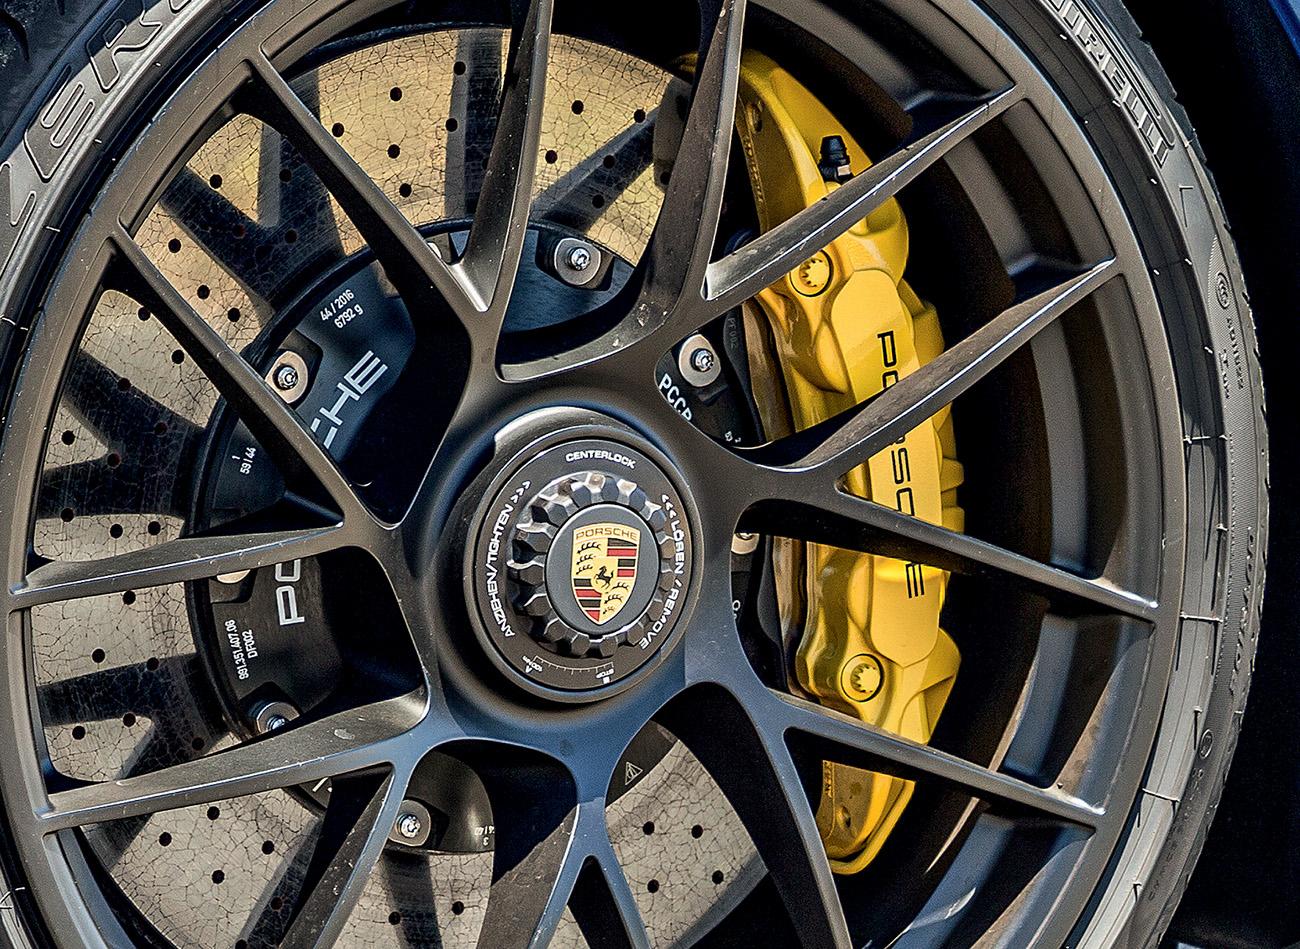 As rodas com porca única no eixo de cubo rápido caracterizam os 911 GTS